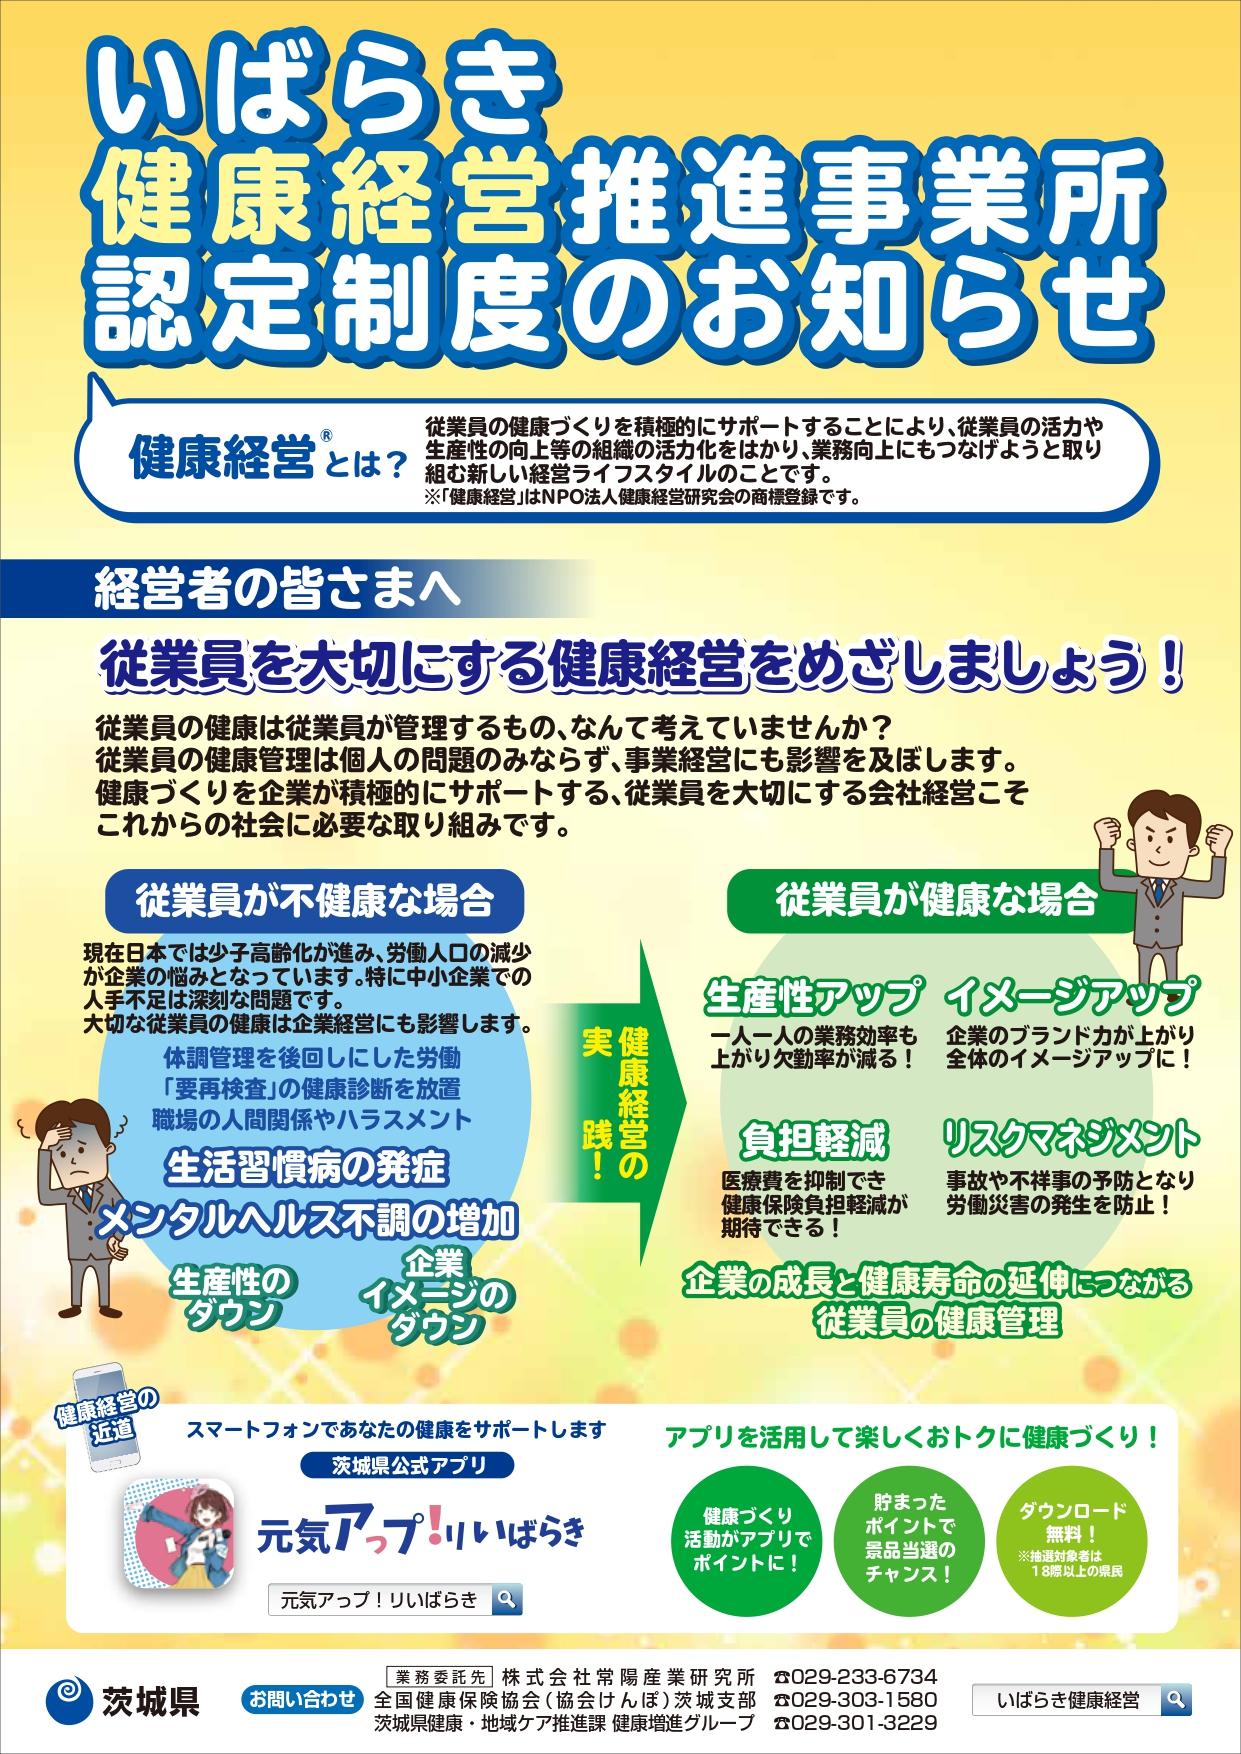 r3_ibaraki_dkenkoukeiei_leaflet_page0001.jpg